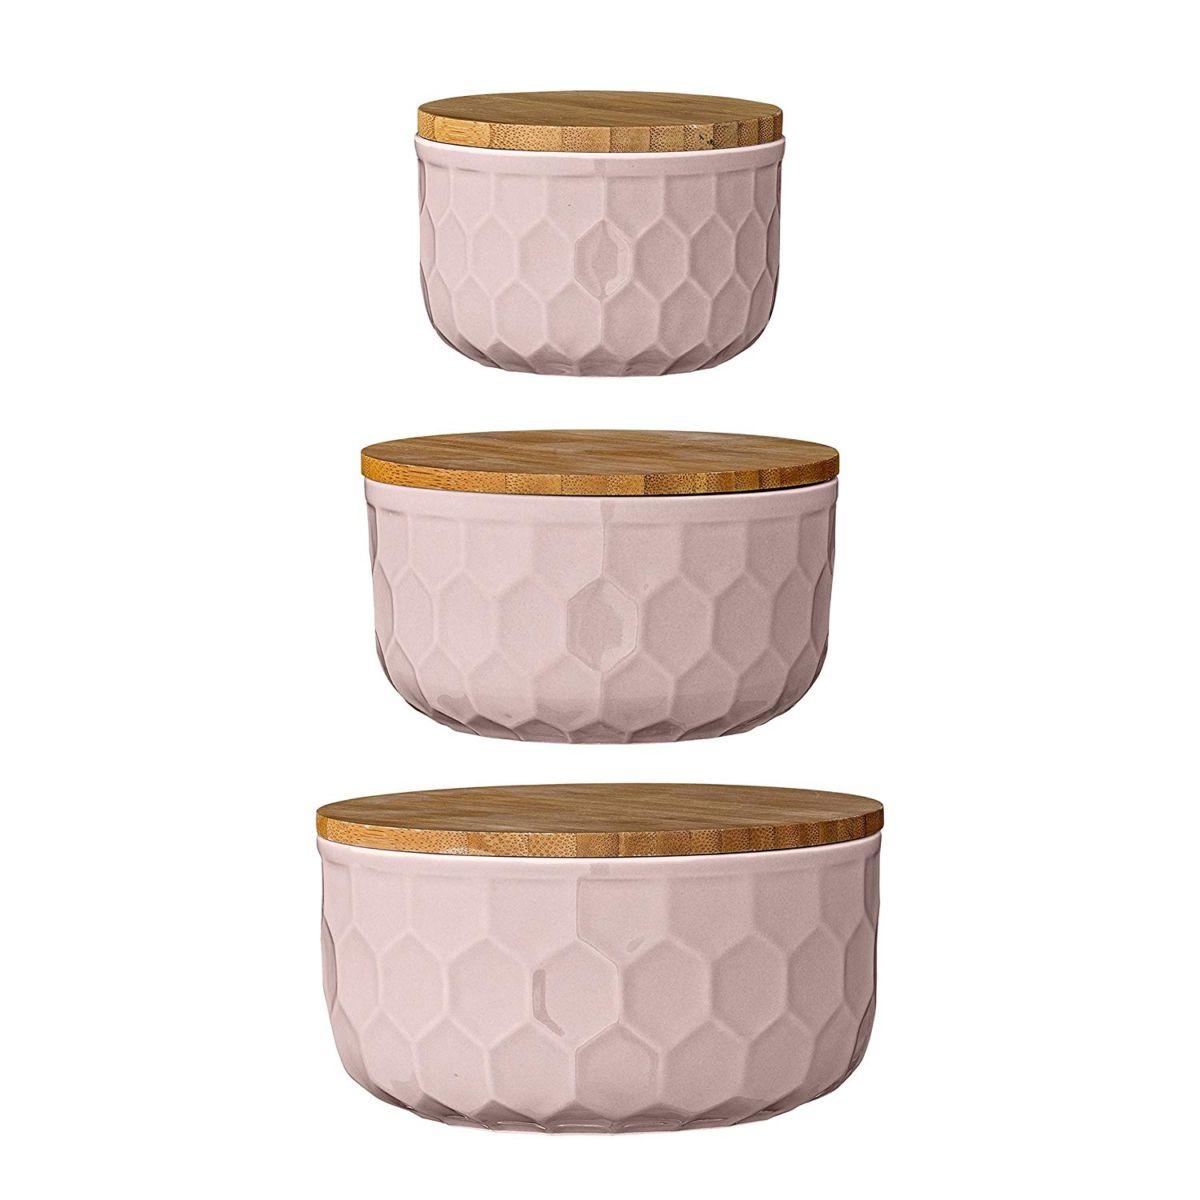 Pink Stoneware Bowls